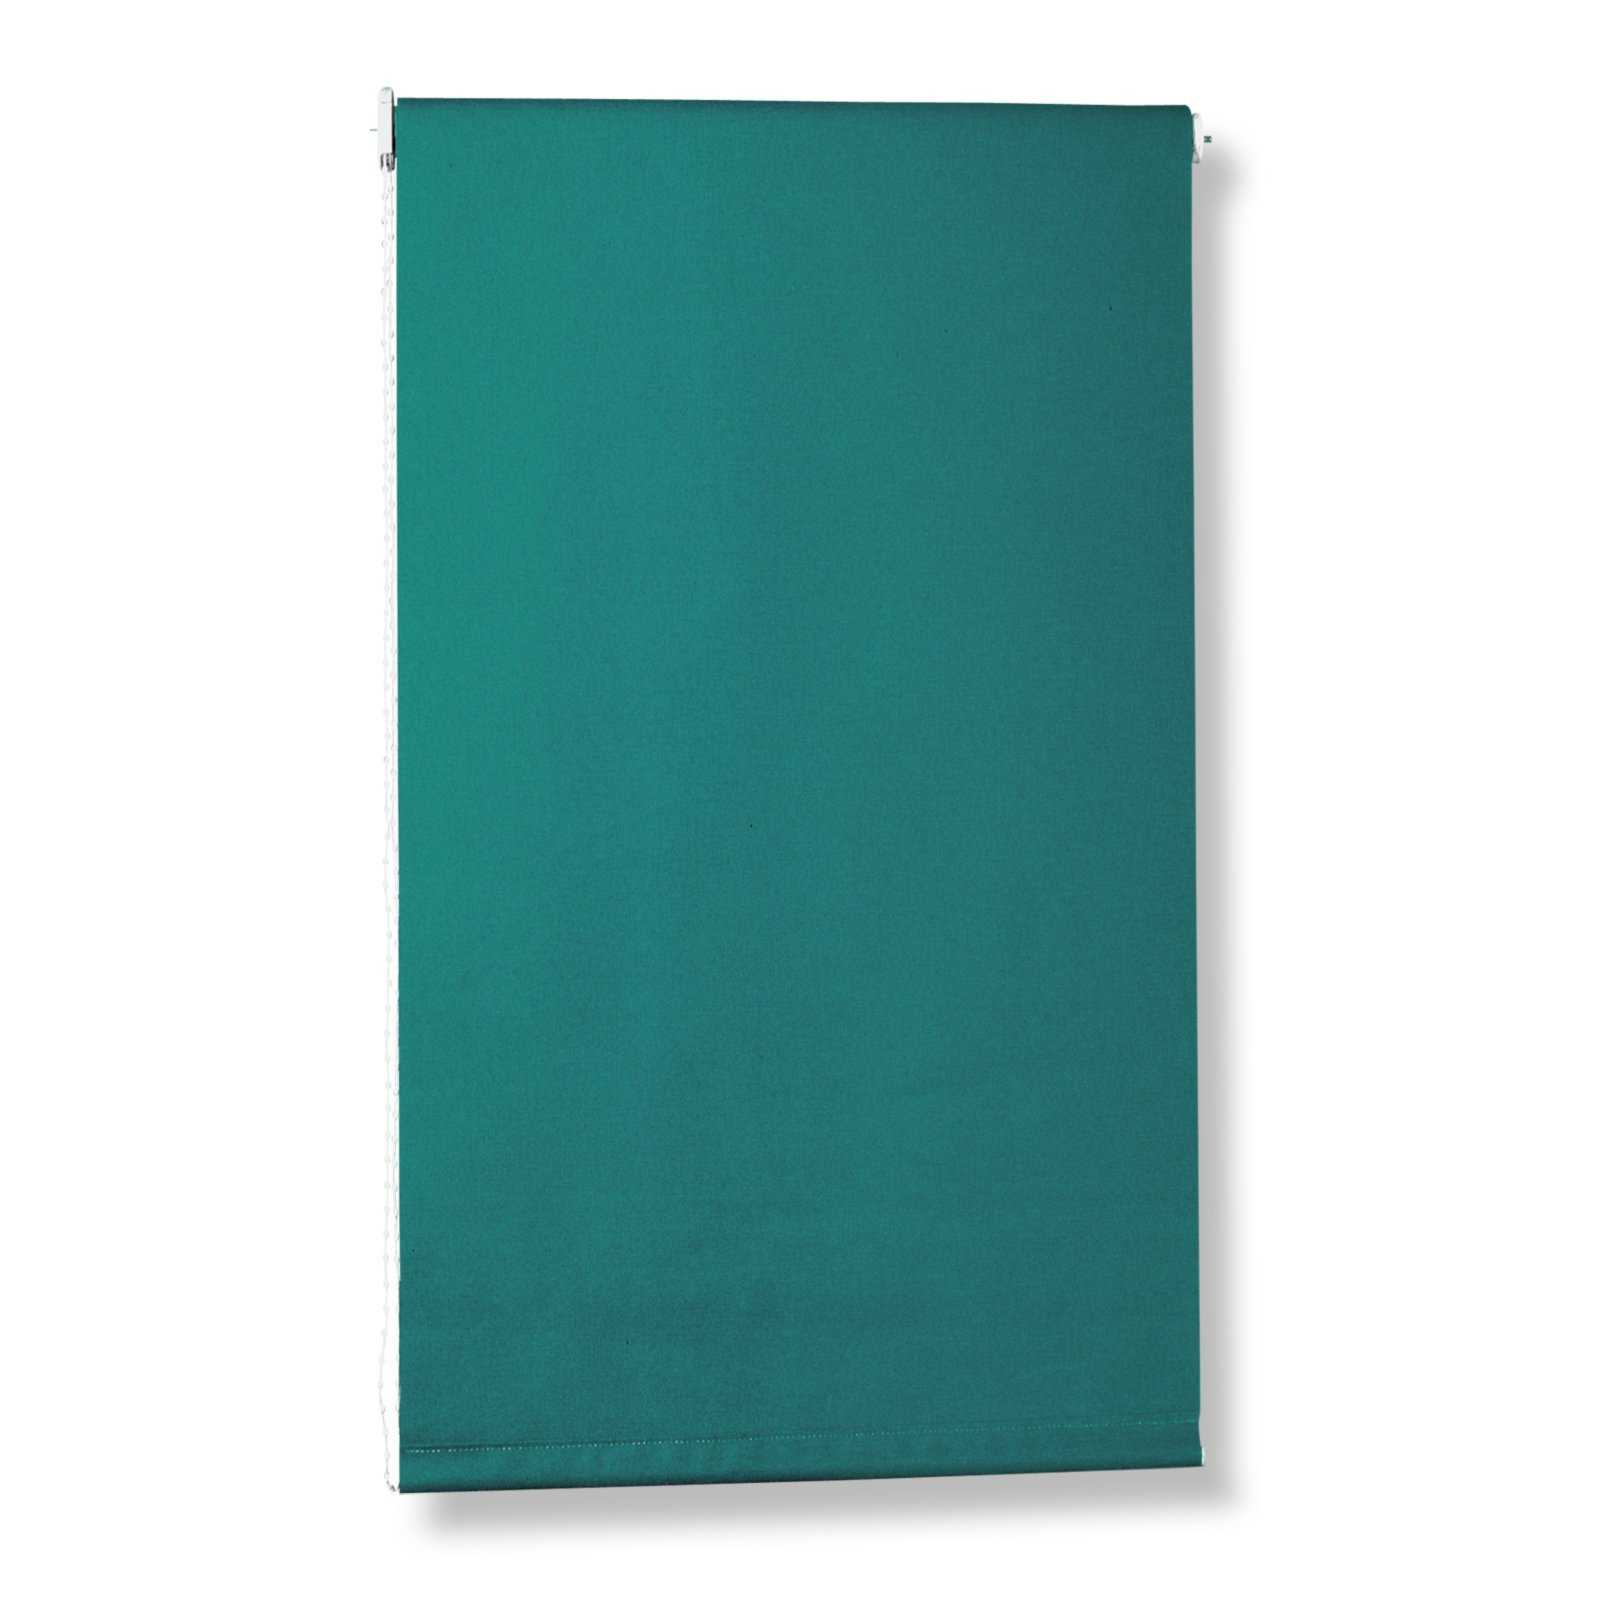 Rollo - mint - 80x180 cm